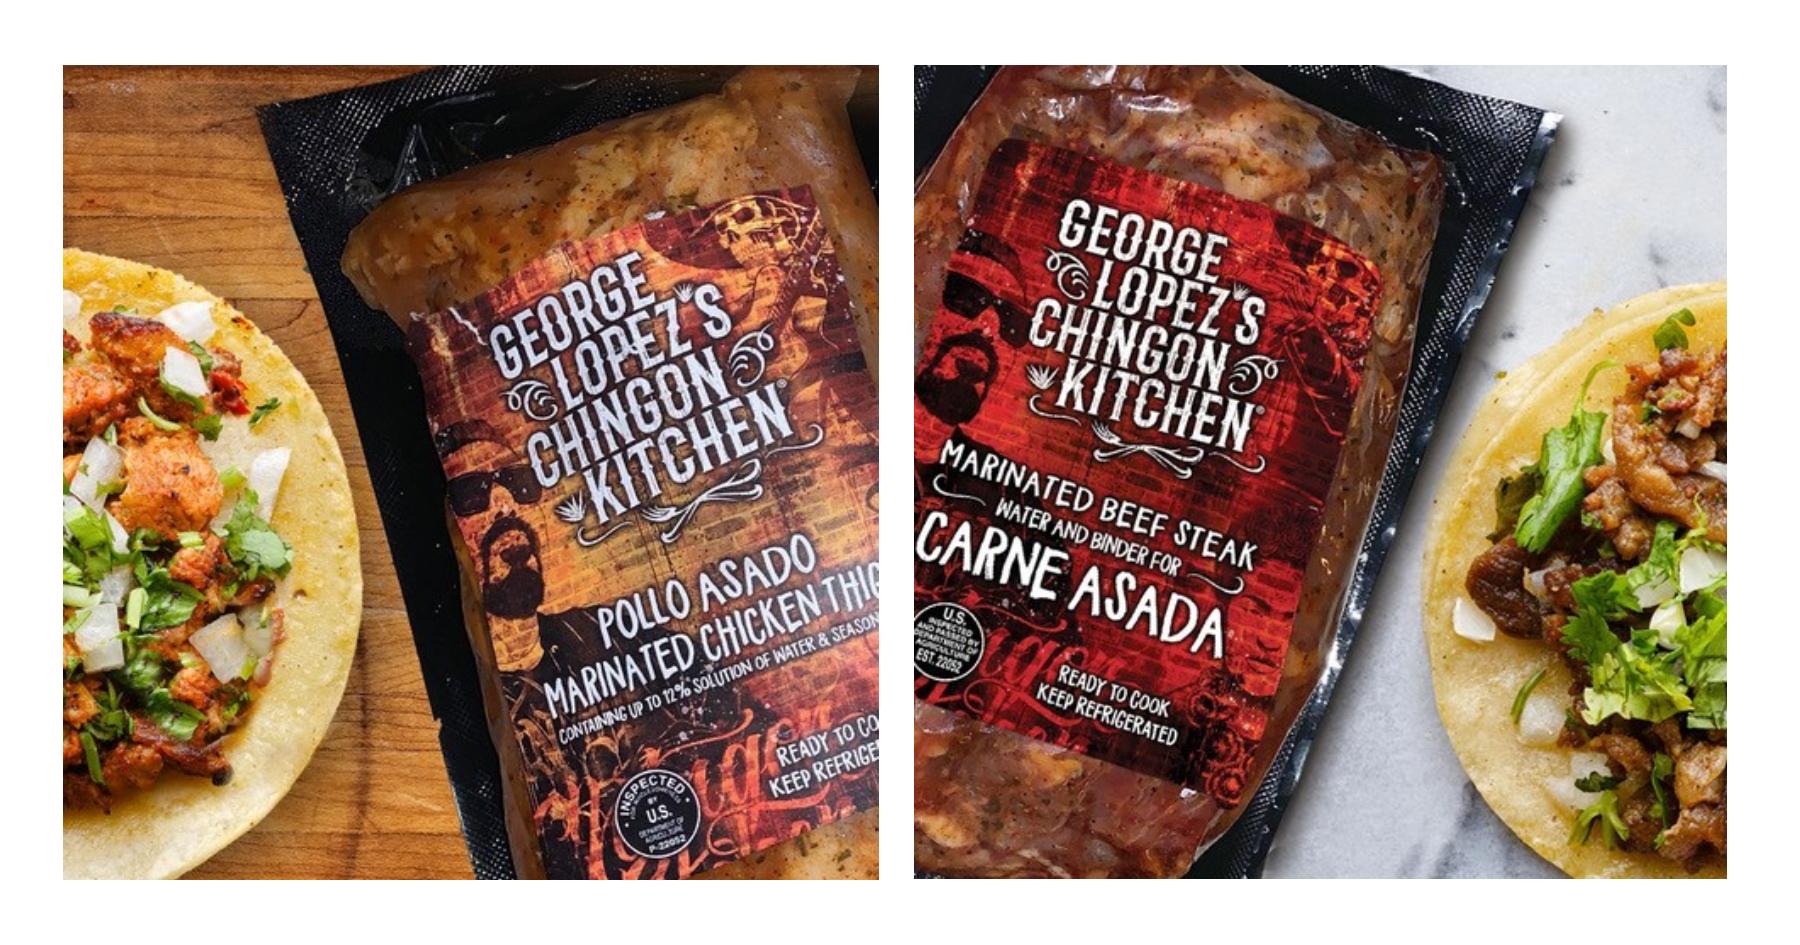 chingon kitchen meats